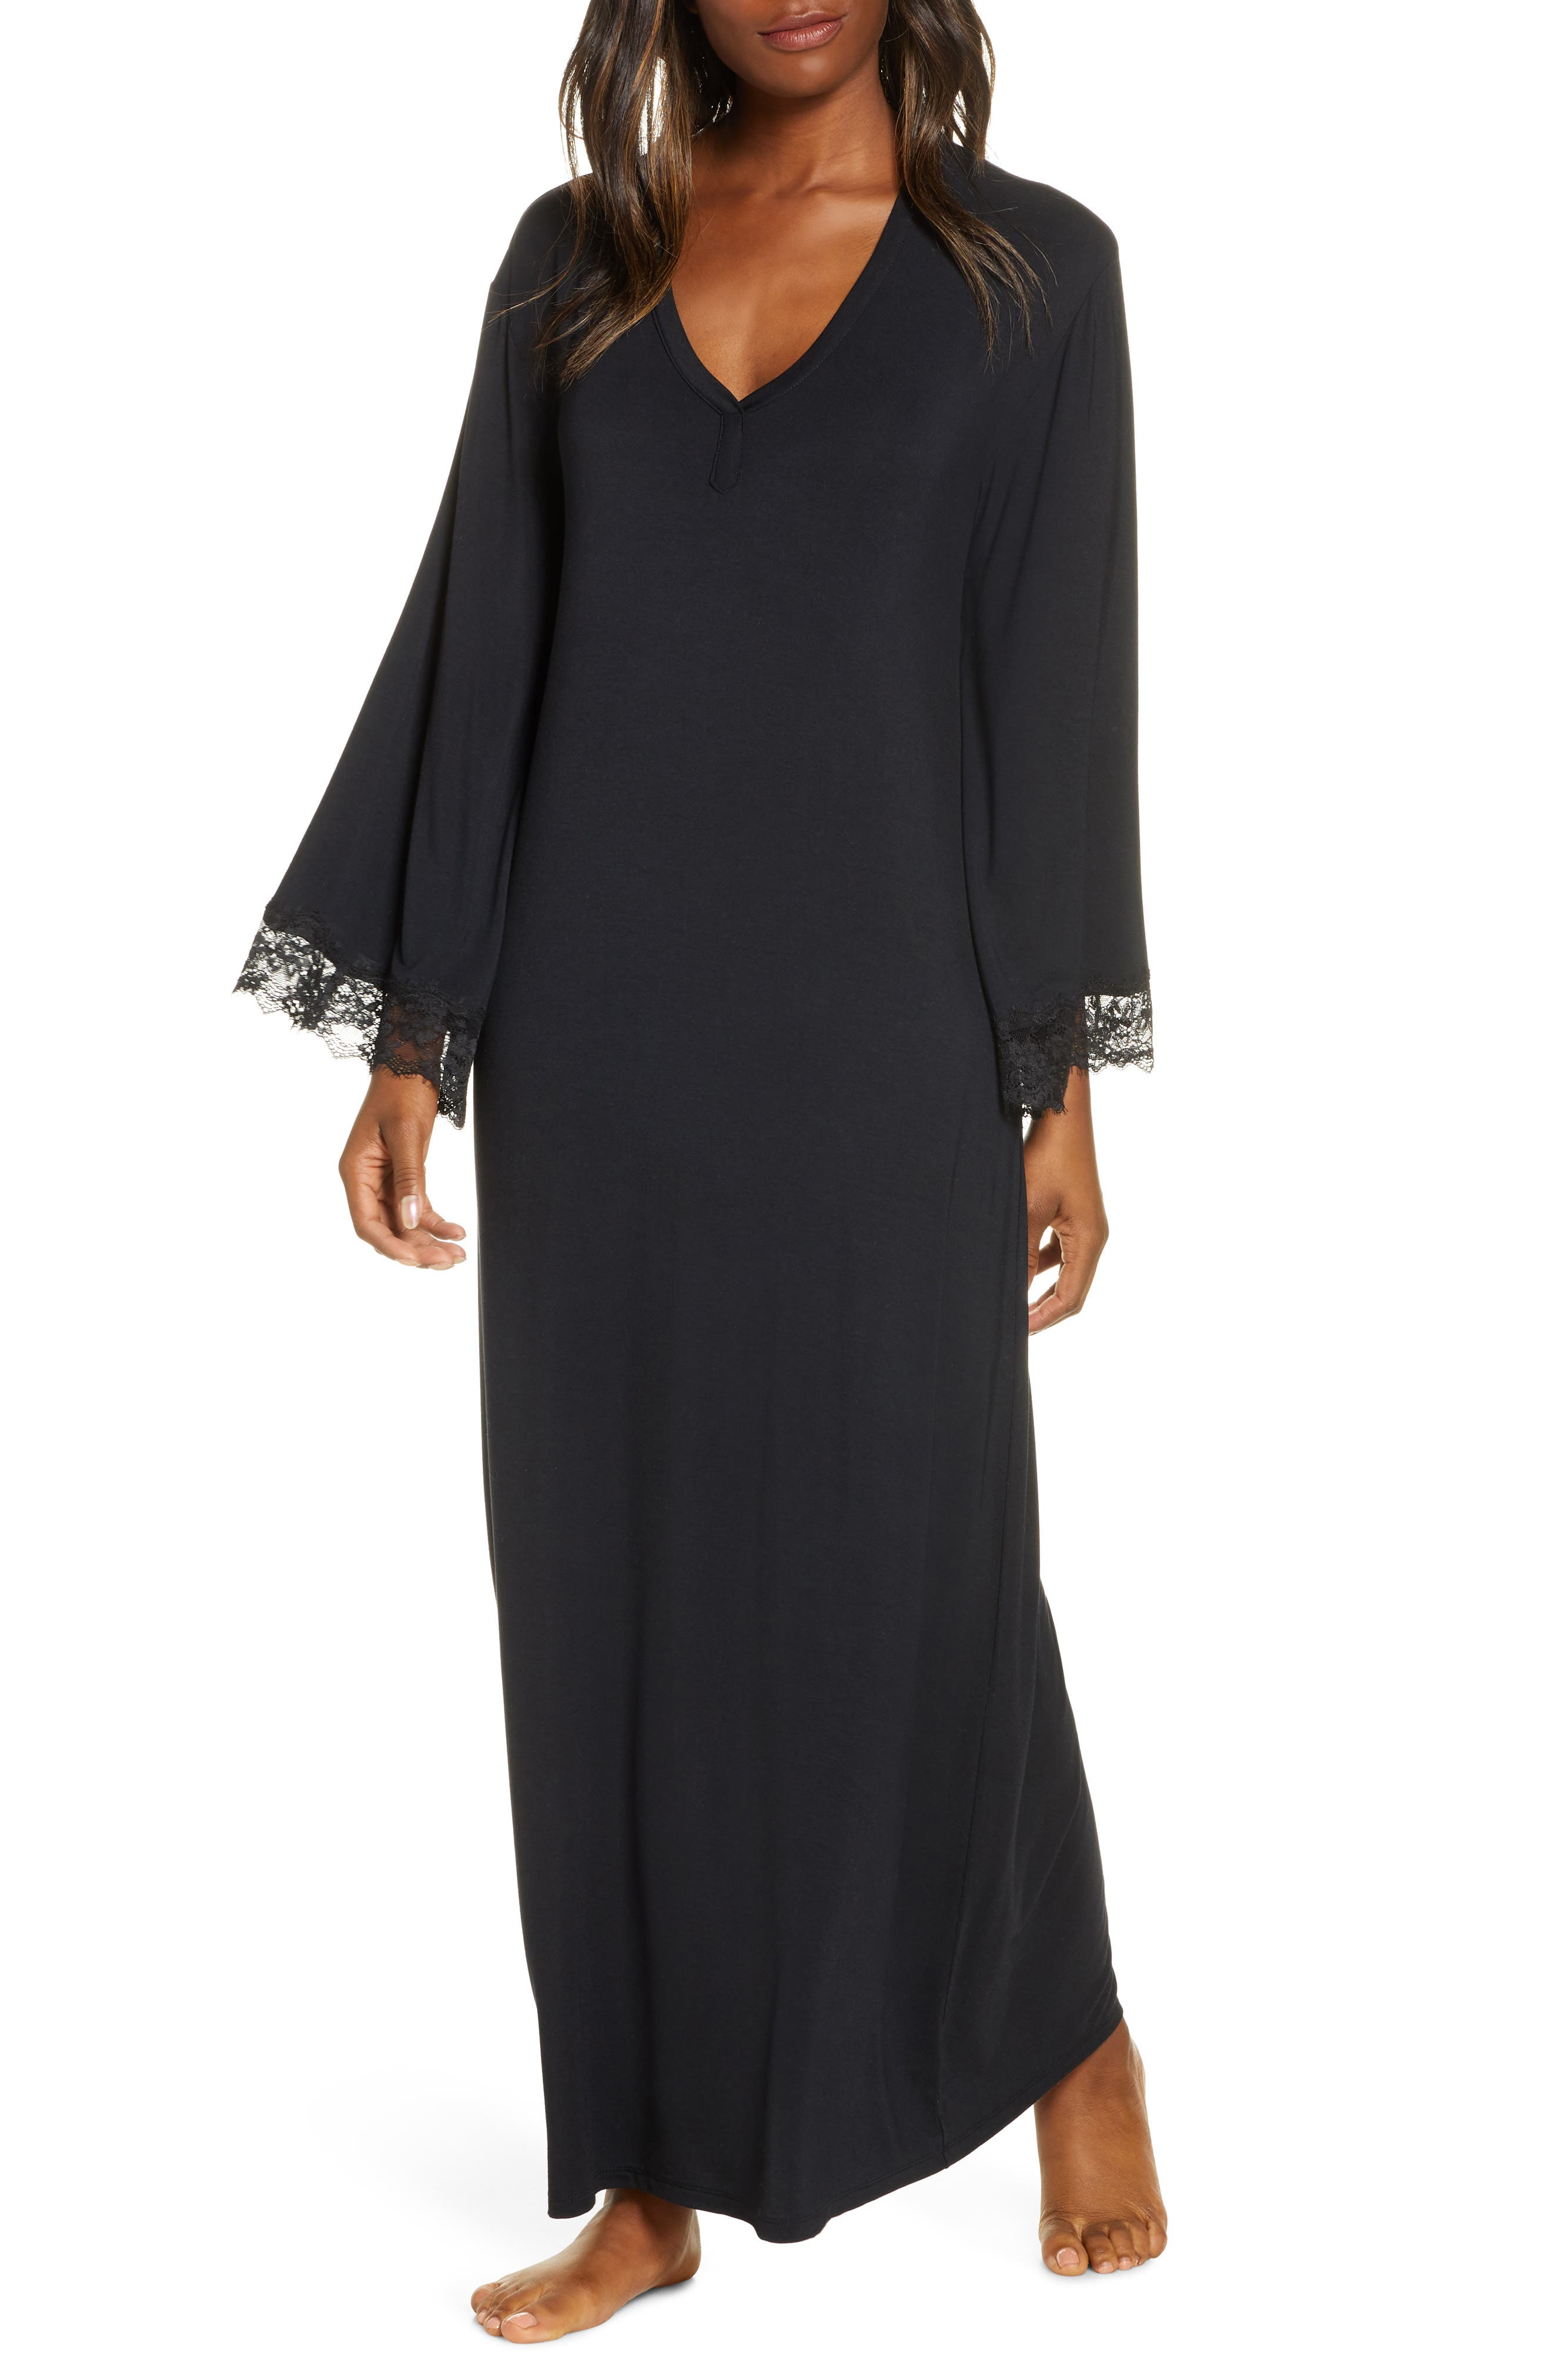 Vintage 1920s Dresses – Where to Buy Womens Nordstrom Lace Trim Knit Caftan $75.00 AT vintagedancer.com